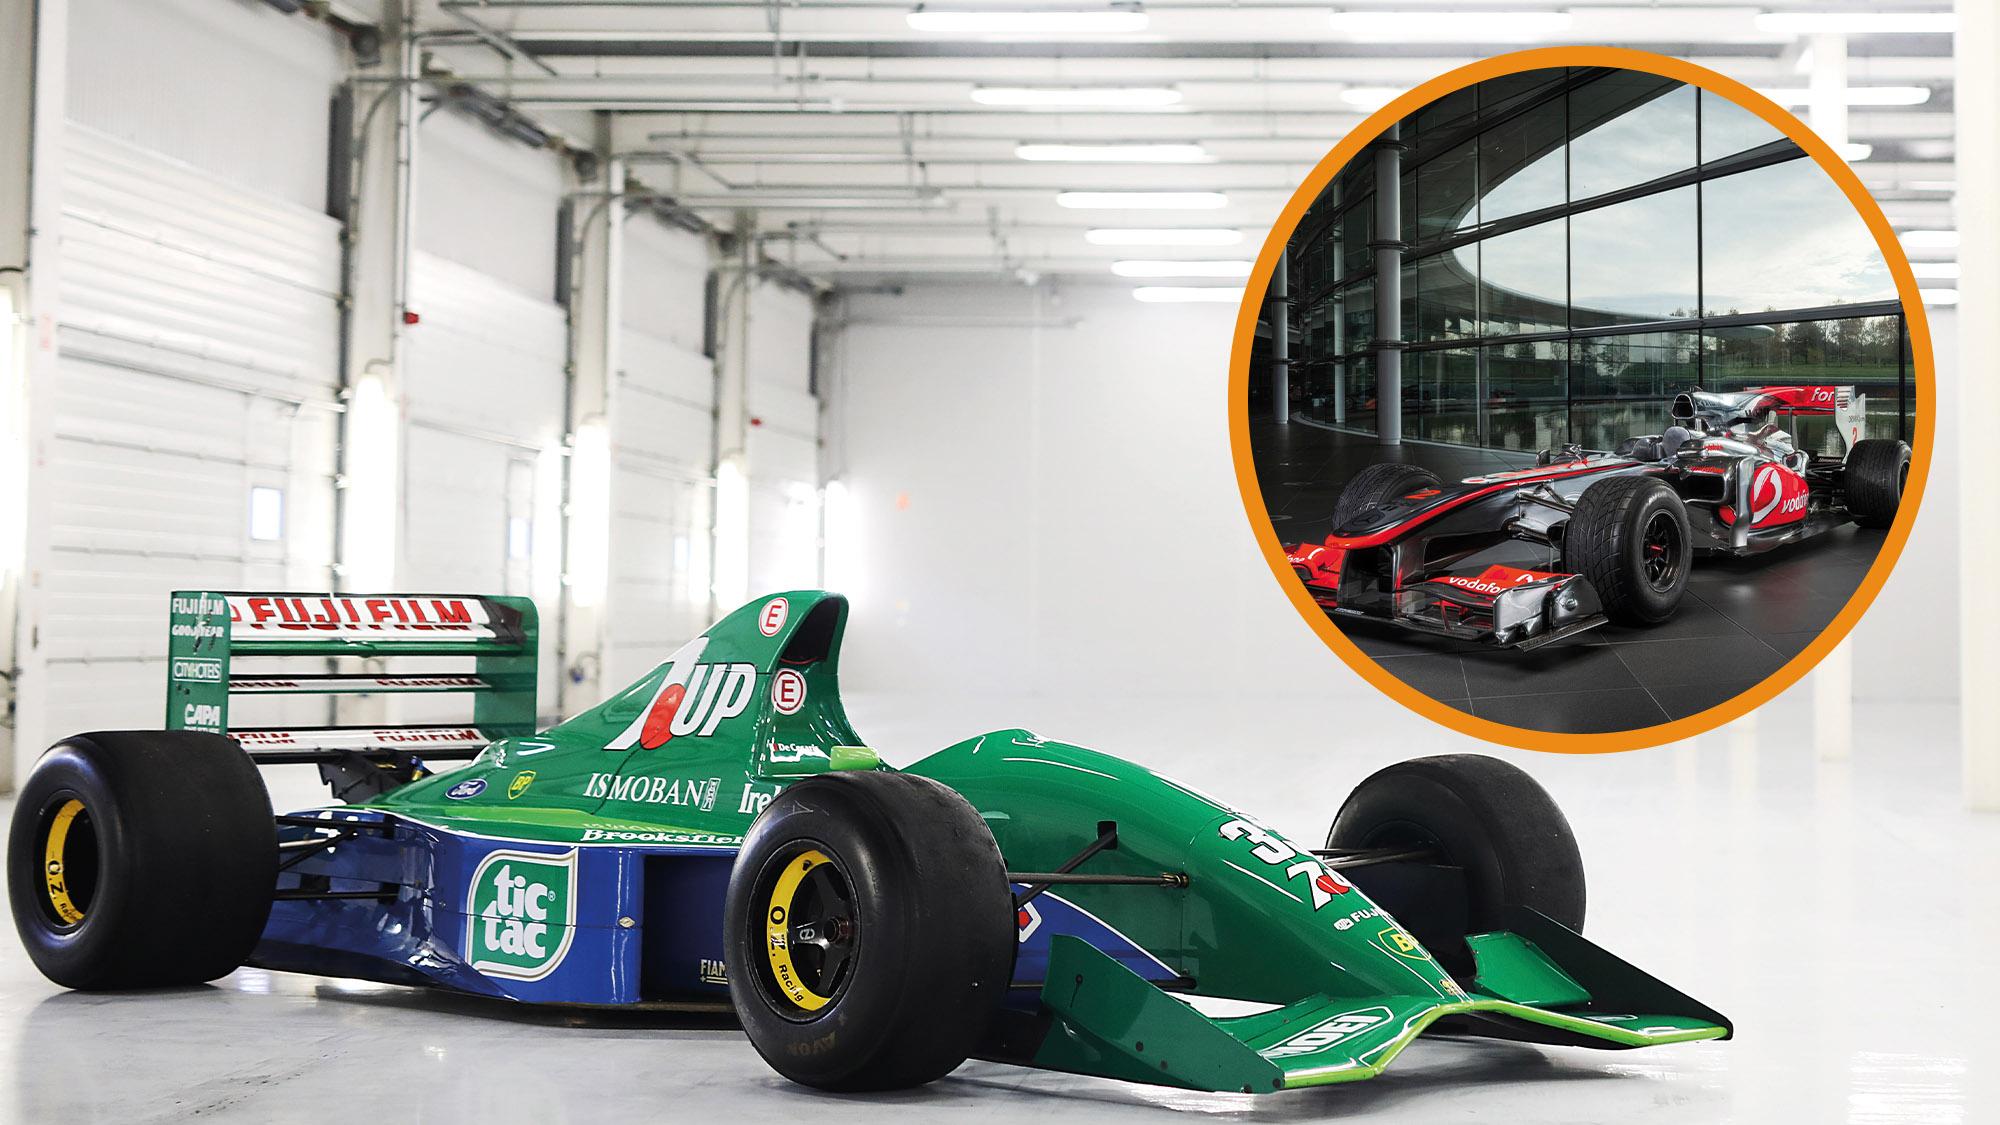 Jordan 191 and McLaren